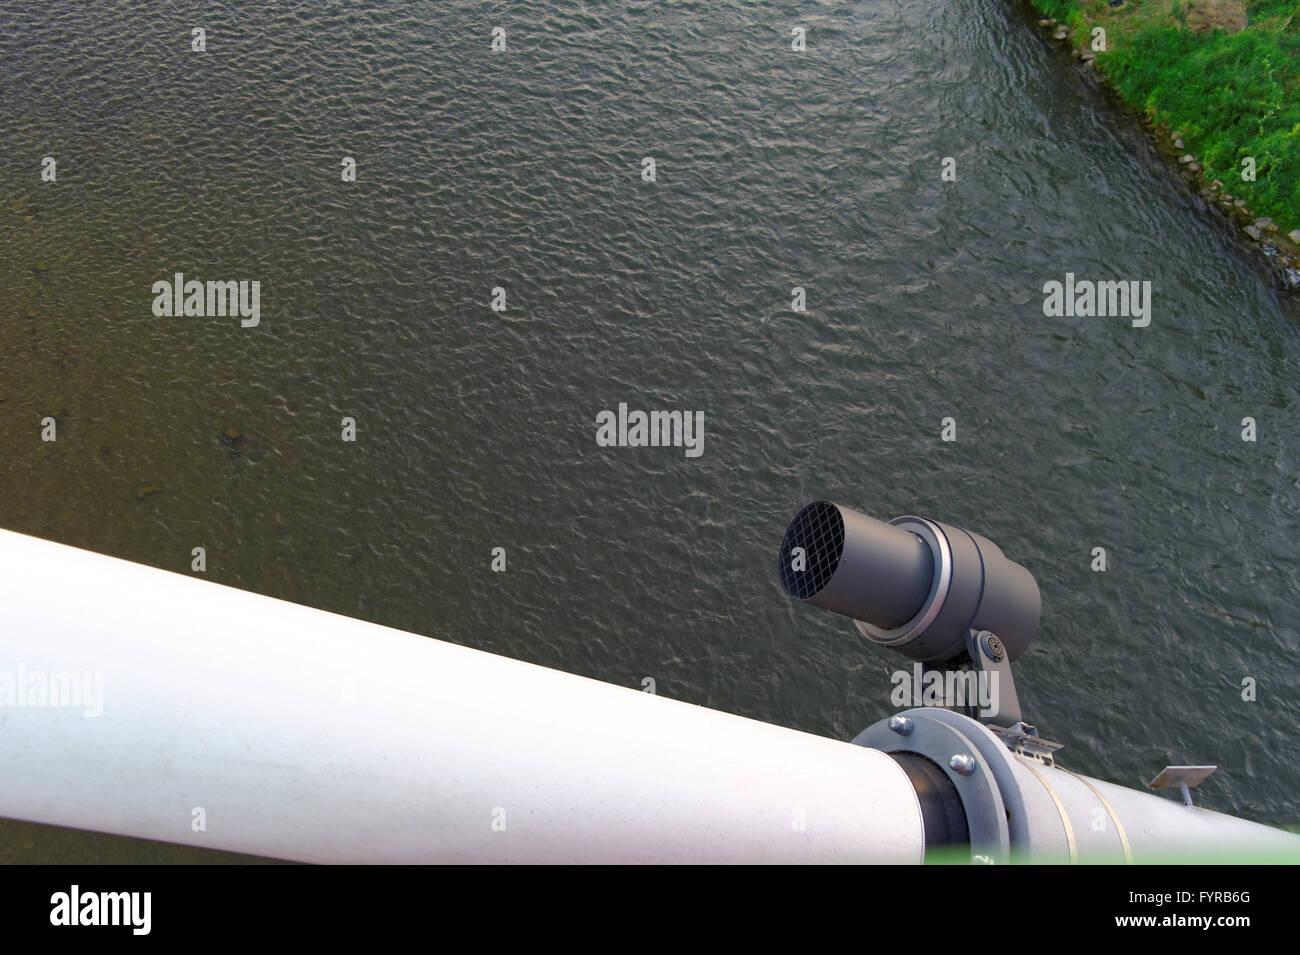 closeup of the spotlight on grider of the bridge Stock Photo